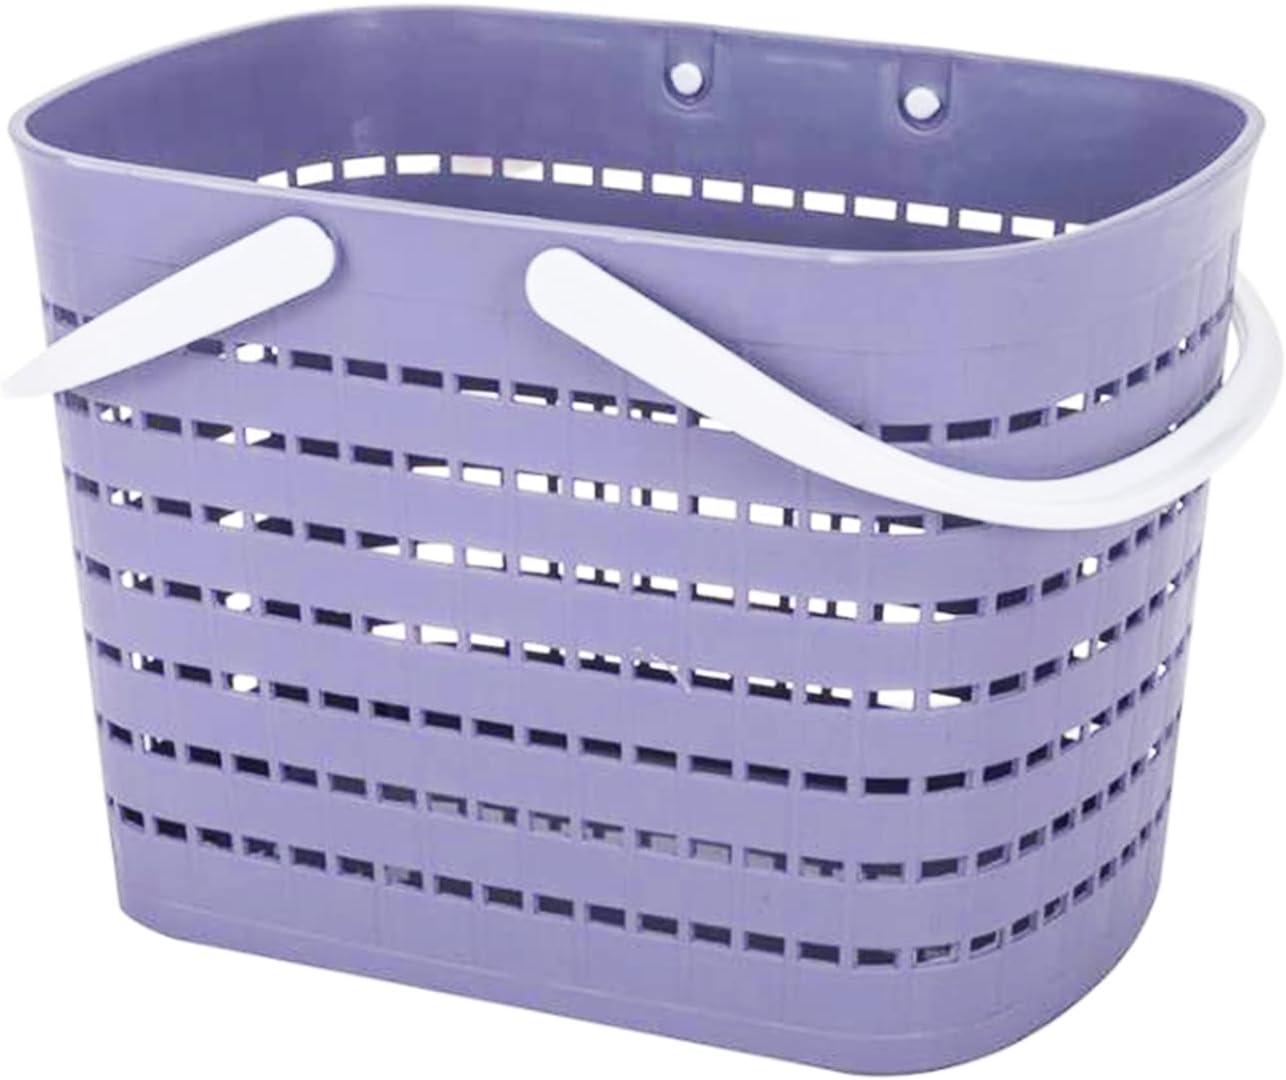 JiatuA Plastic Storage Basket with Handle, Shower Caddy Tote Organizer Bins for Bathroom Dorm Kitchen Office Home